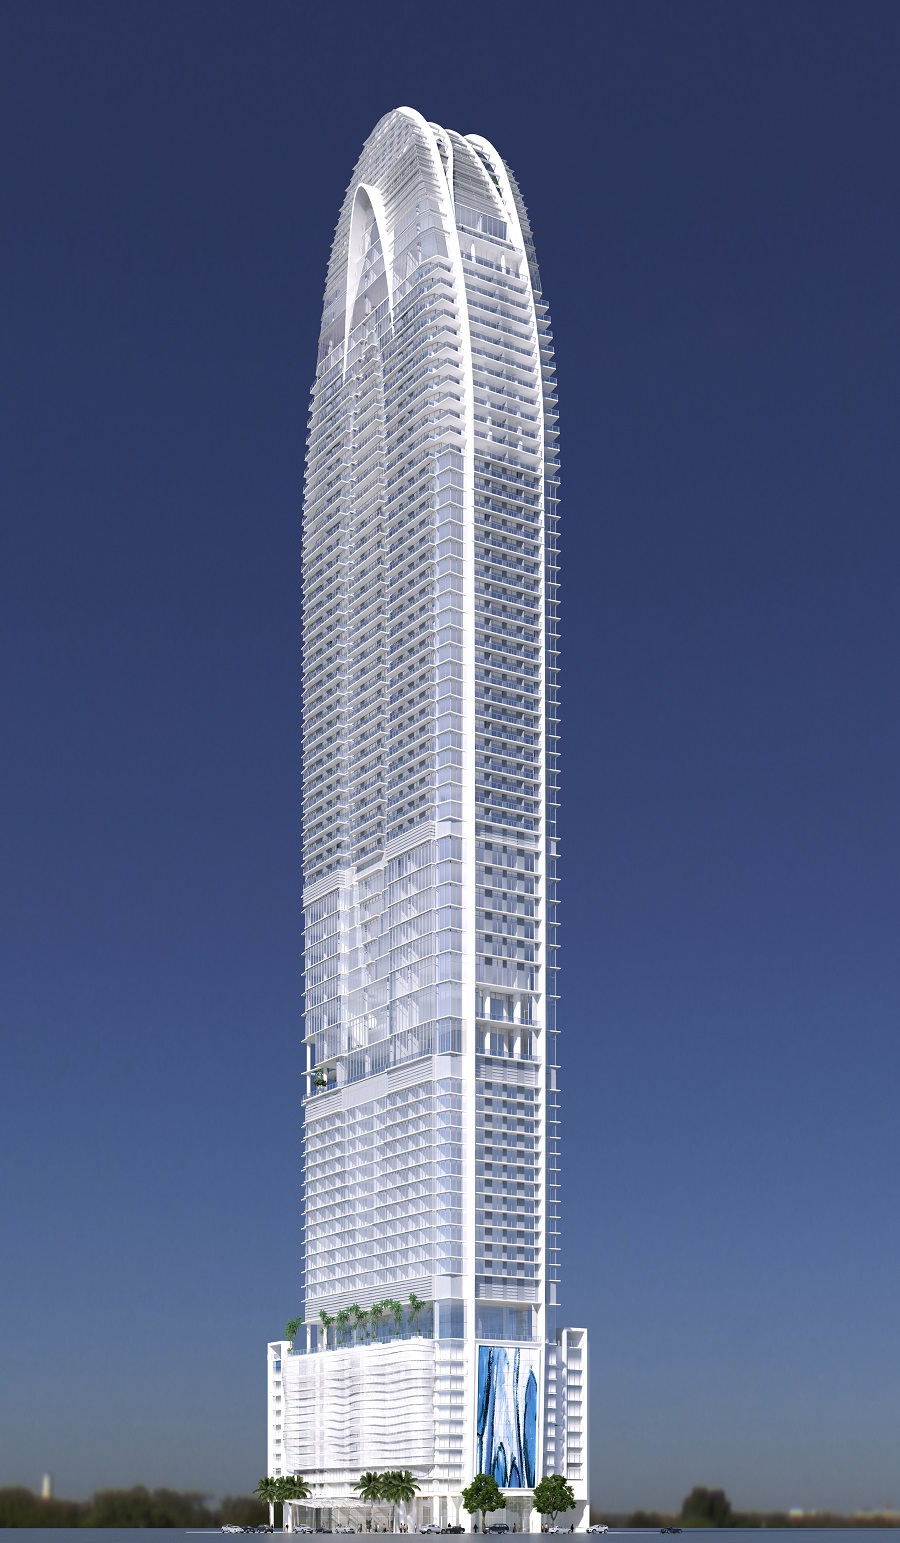 Okan Tower Miami Condo Hotel Center